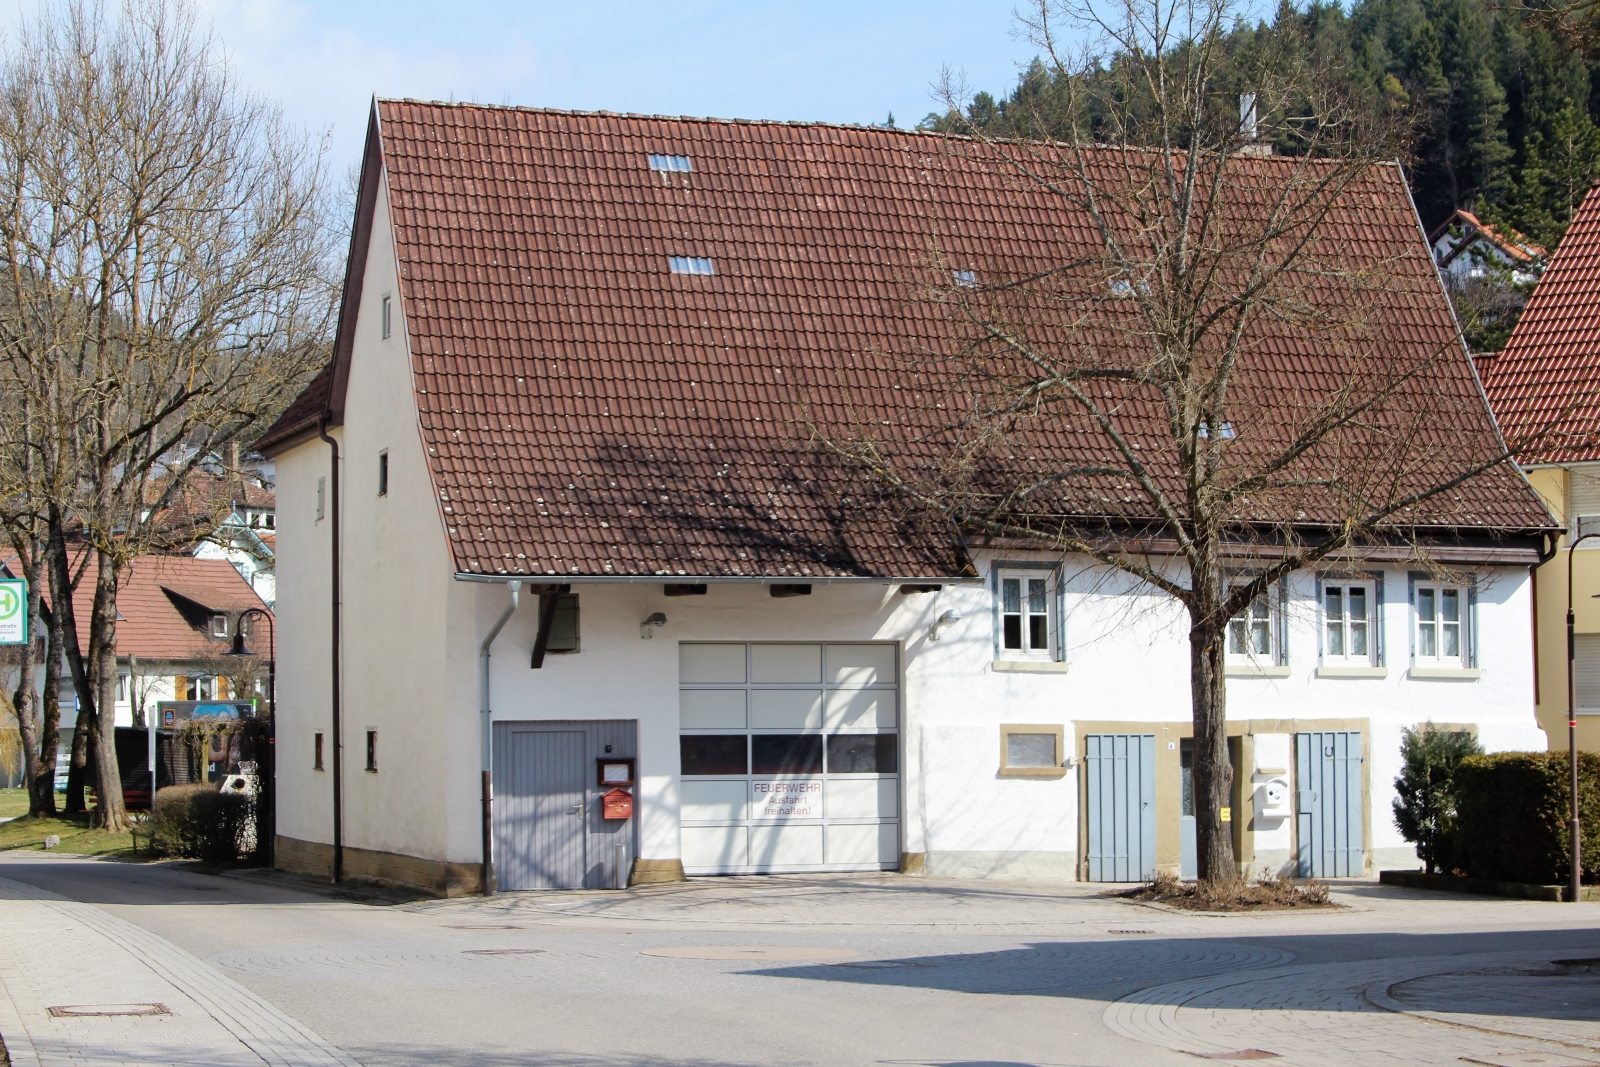 Feuerwehrgerätehaus Iselshausen